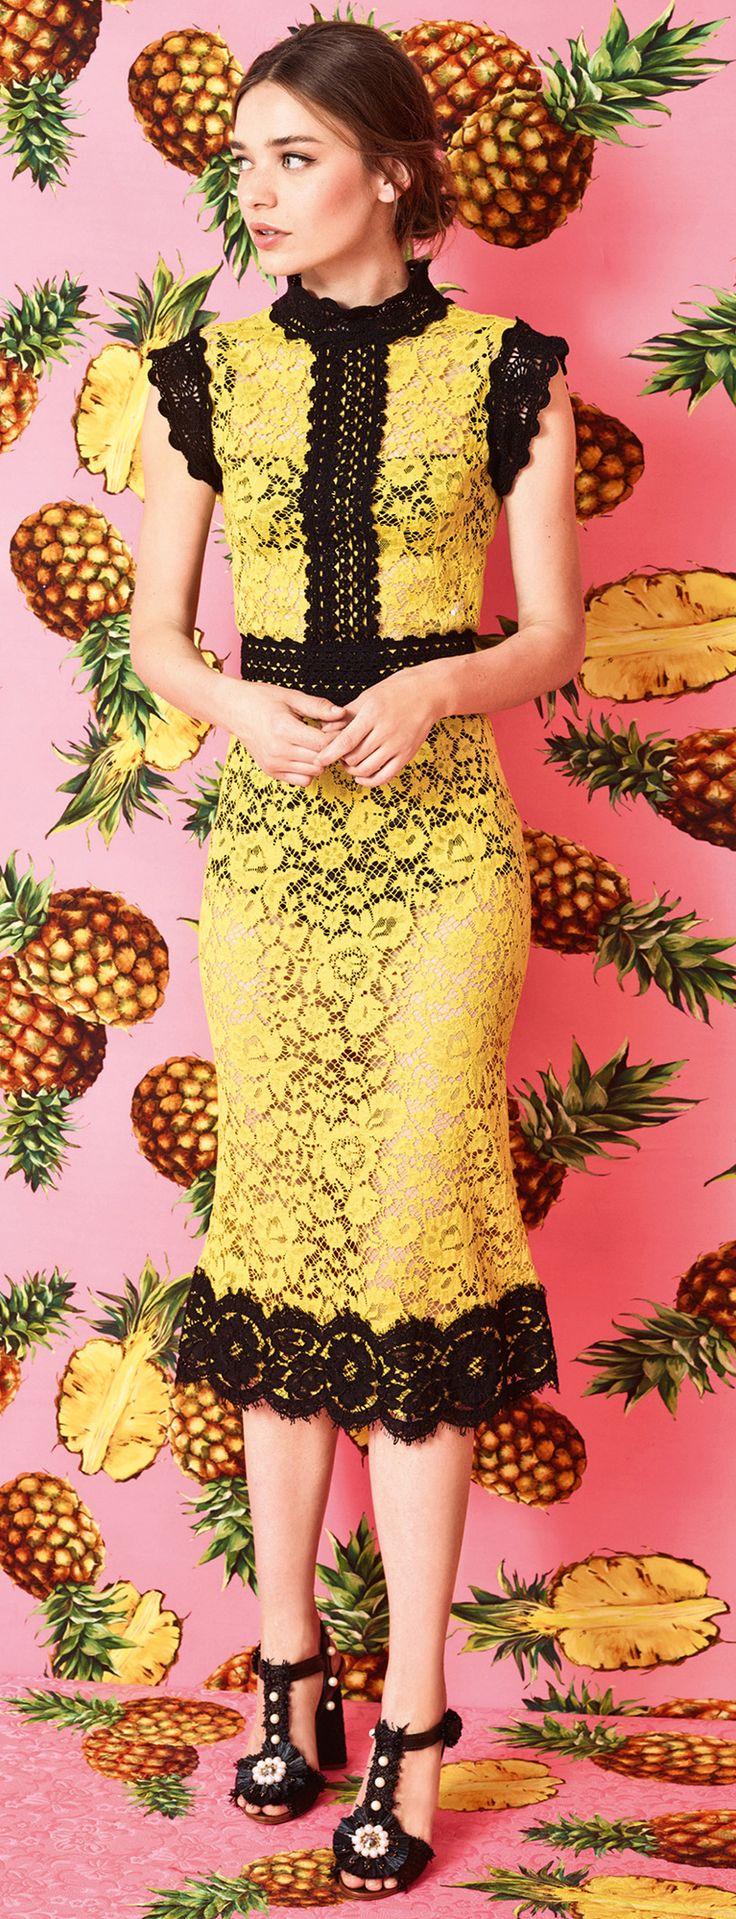 Dolce & Gabbana Spring Summer 2017 Collection Tropical City